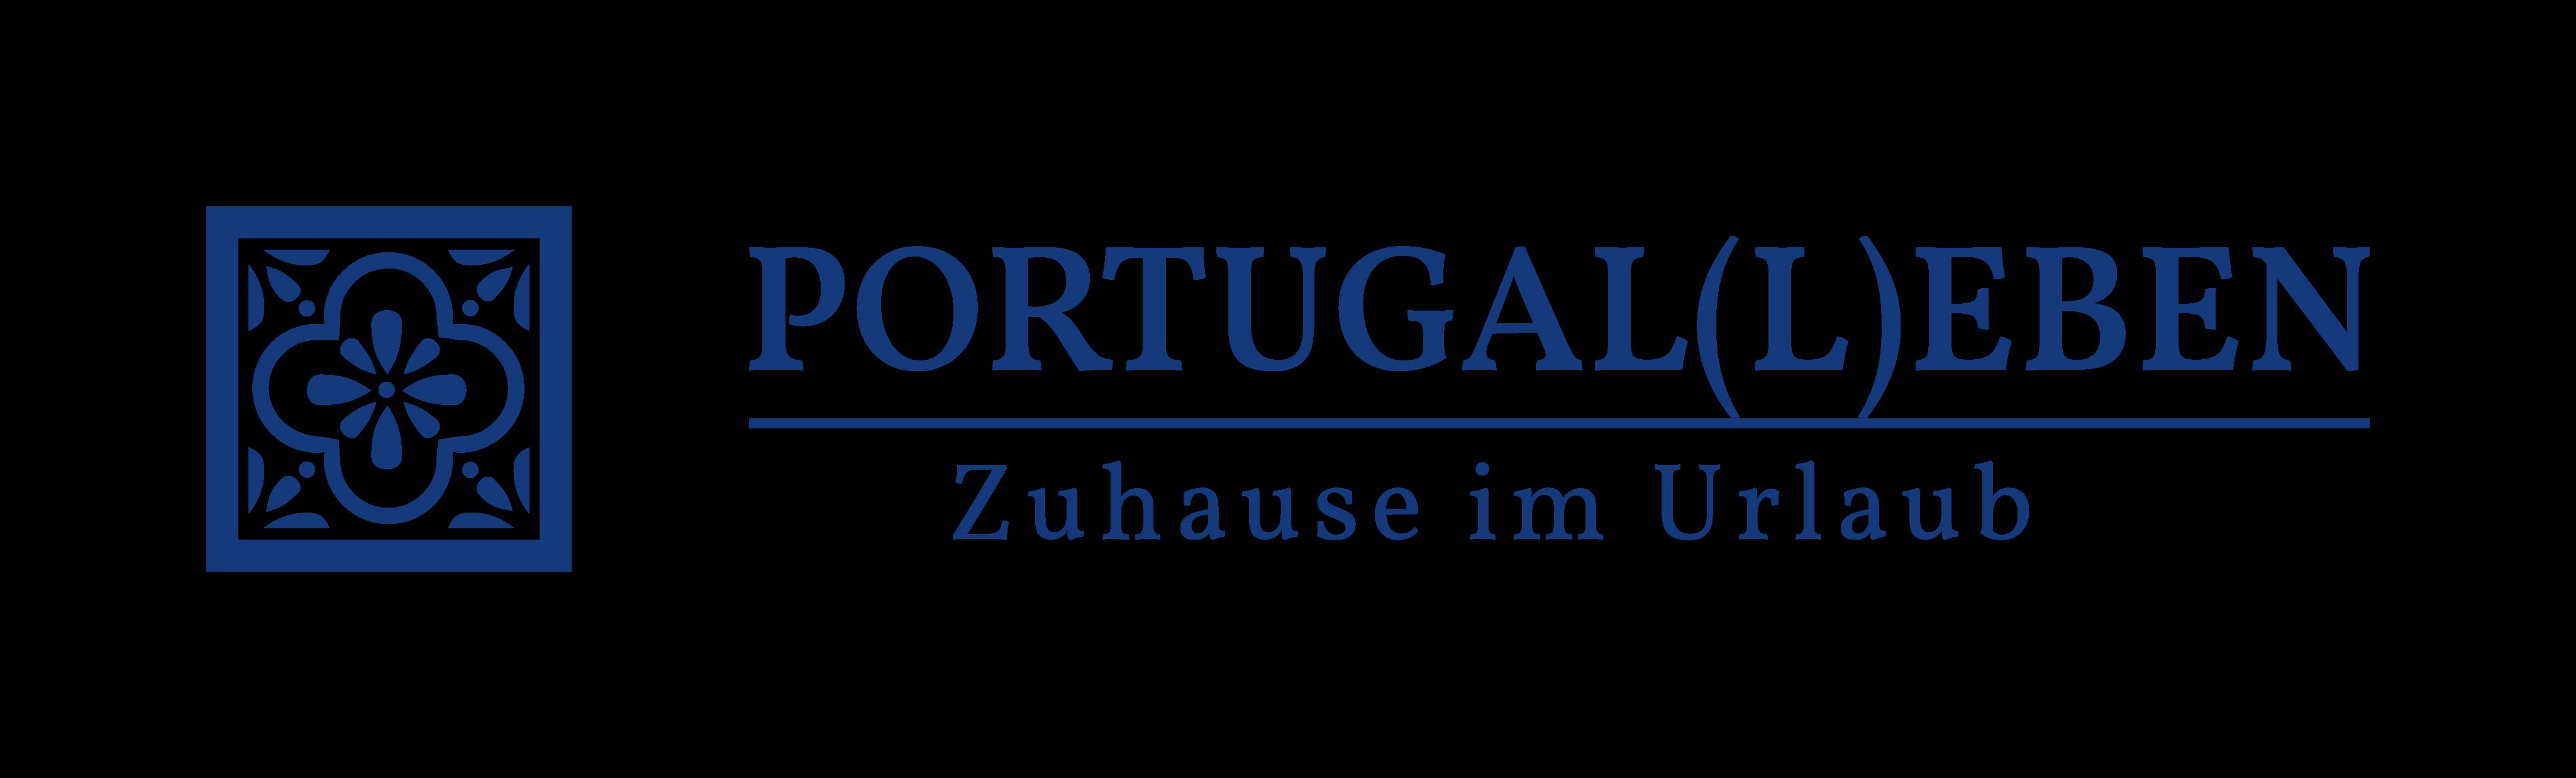 Portugal(l)eben-Logo